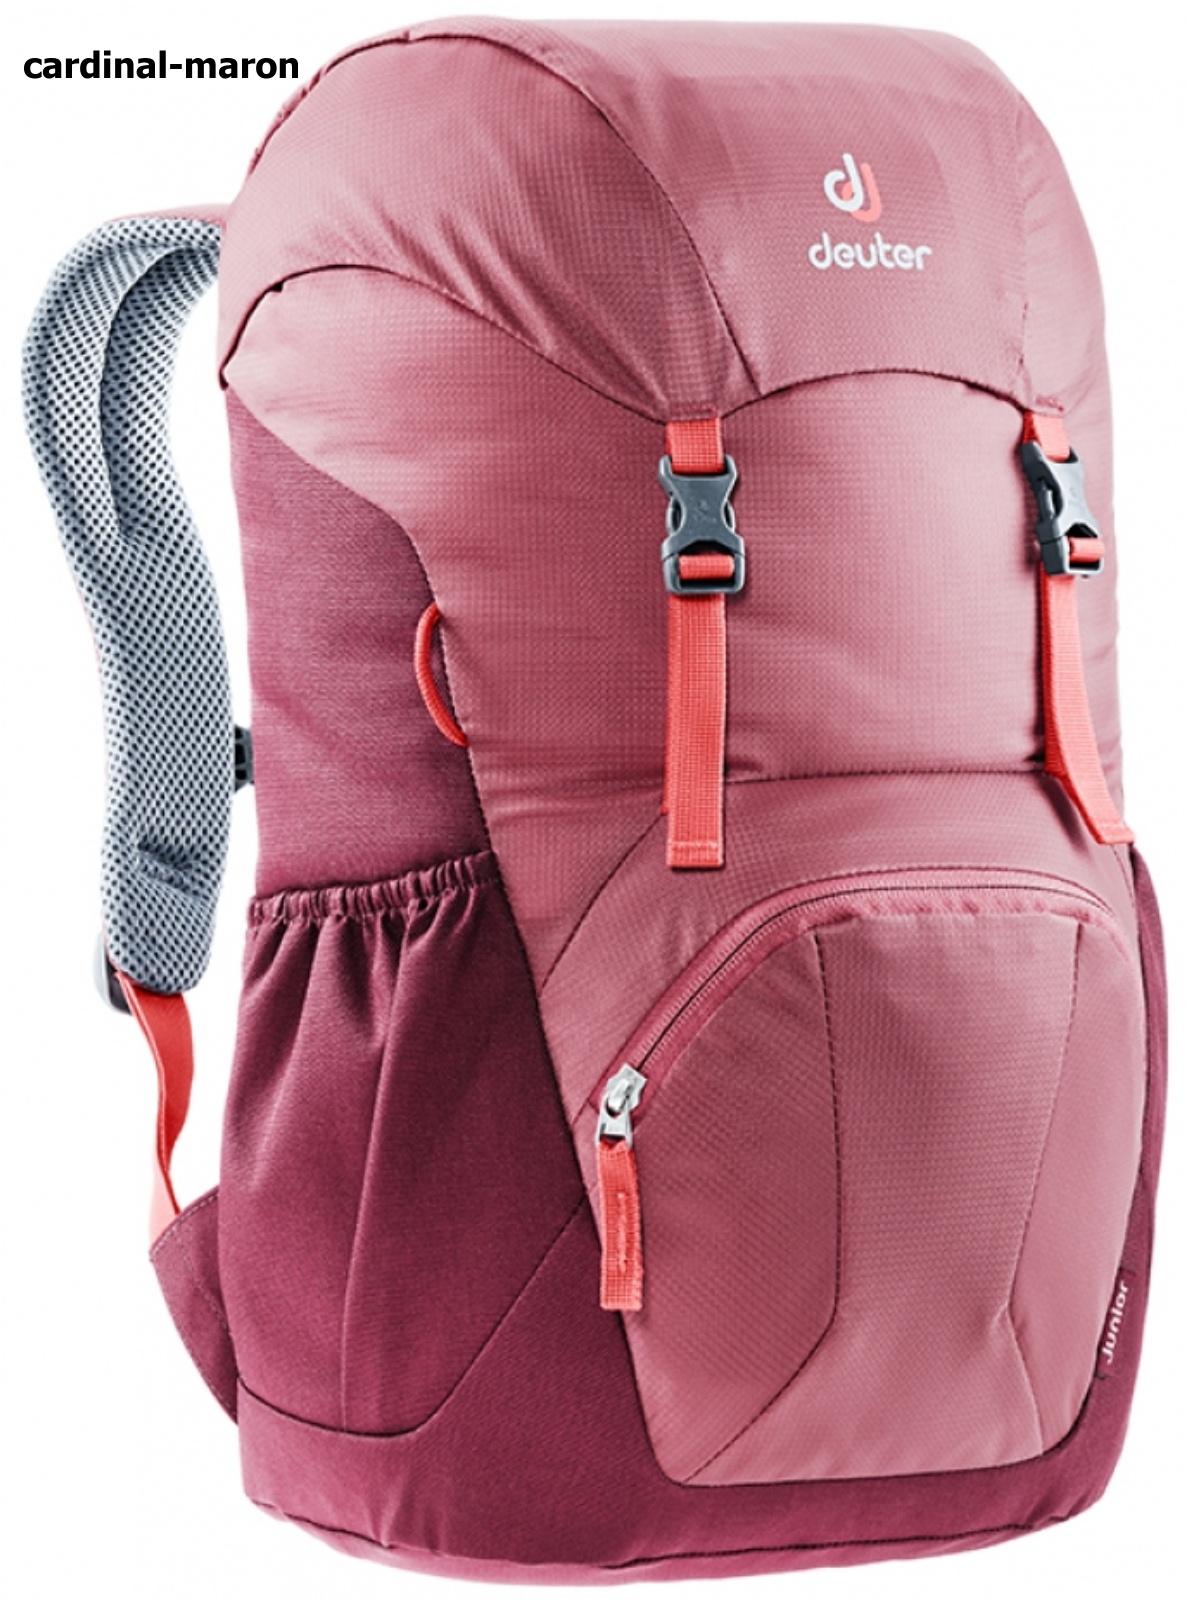 Dětský batoh DEUTER Junior 18 l - cardinal-maron